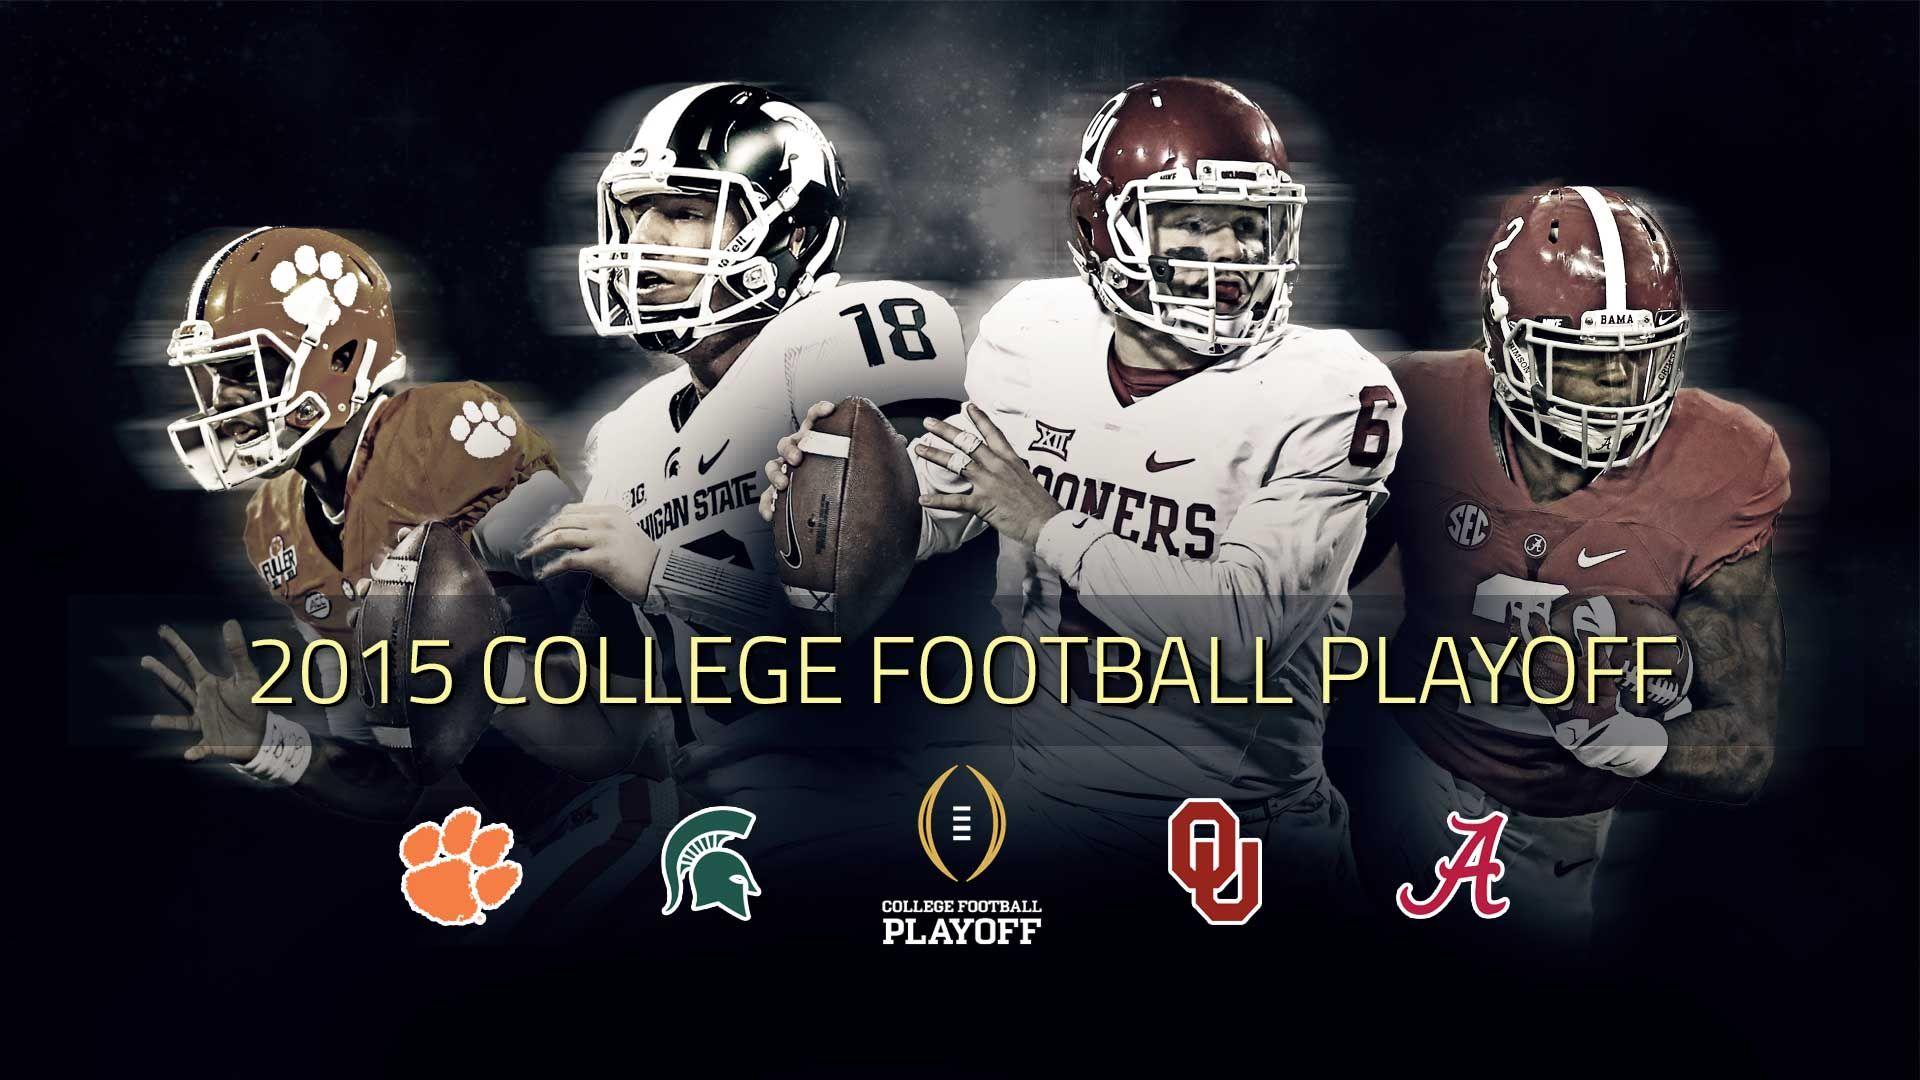 College Football Playoff Semifinals Set With Clemson Alabama Michigan St Oklahoma College Football Playoff College Football Michigan State Football